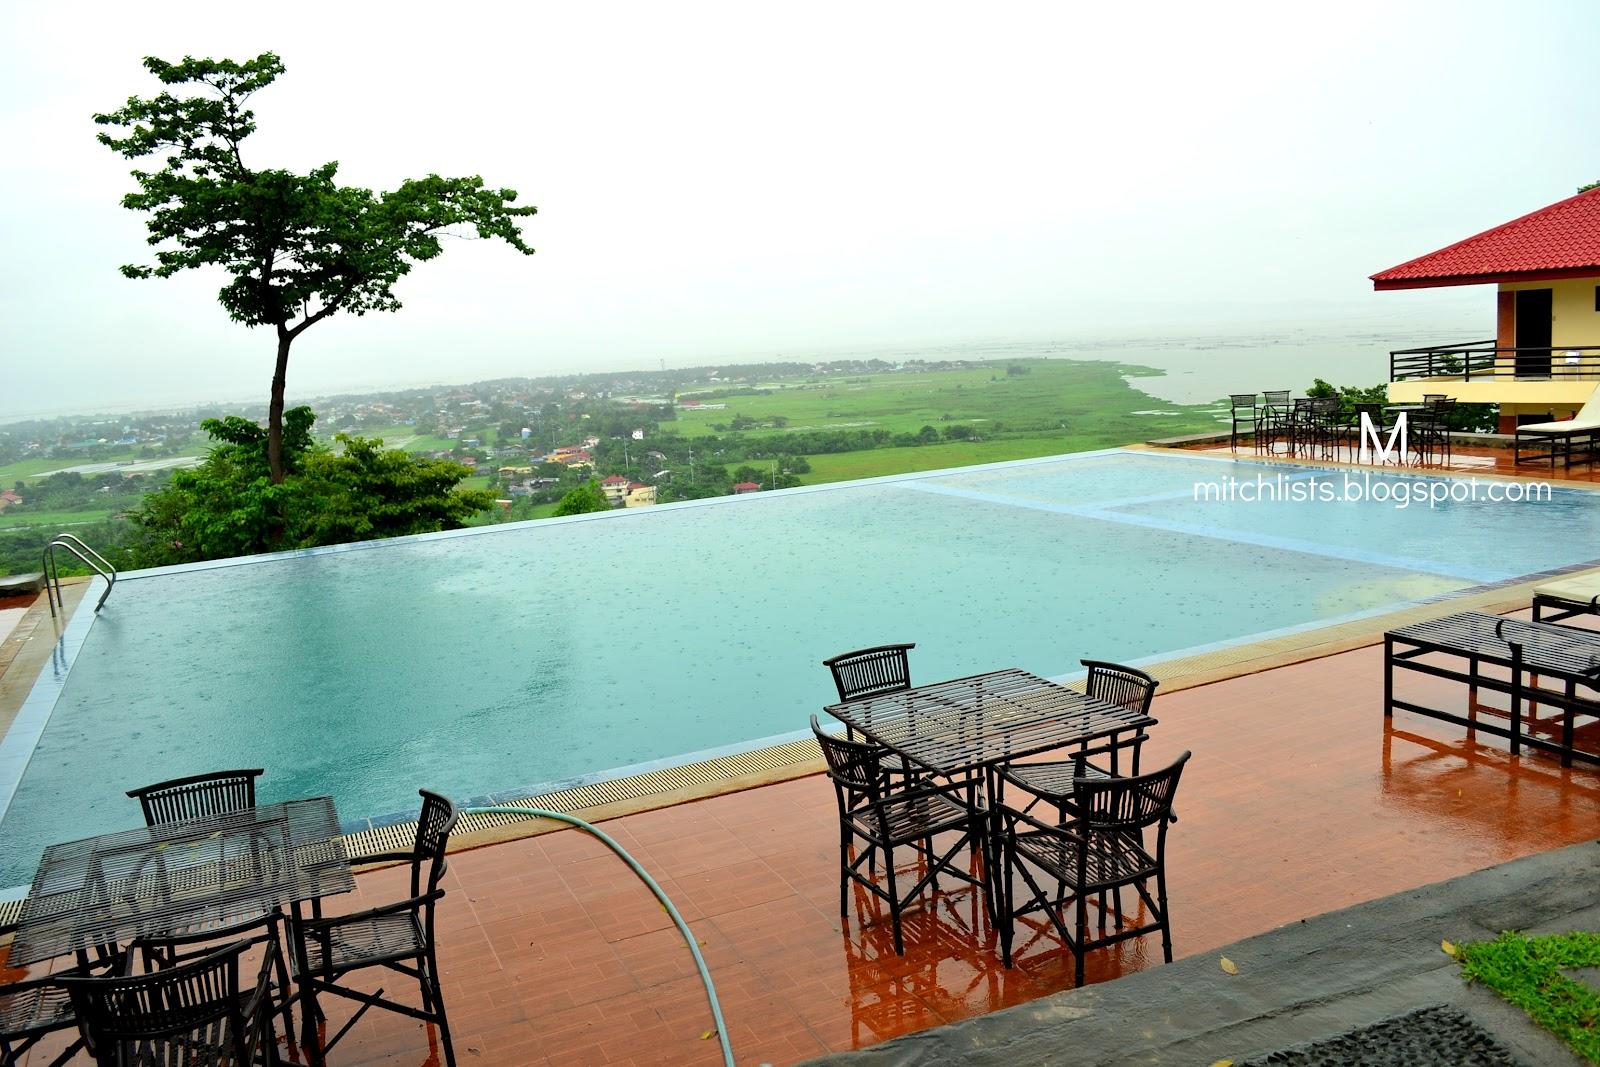 Overlooking Resorts In Rizal